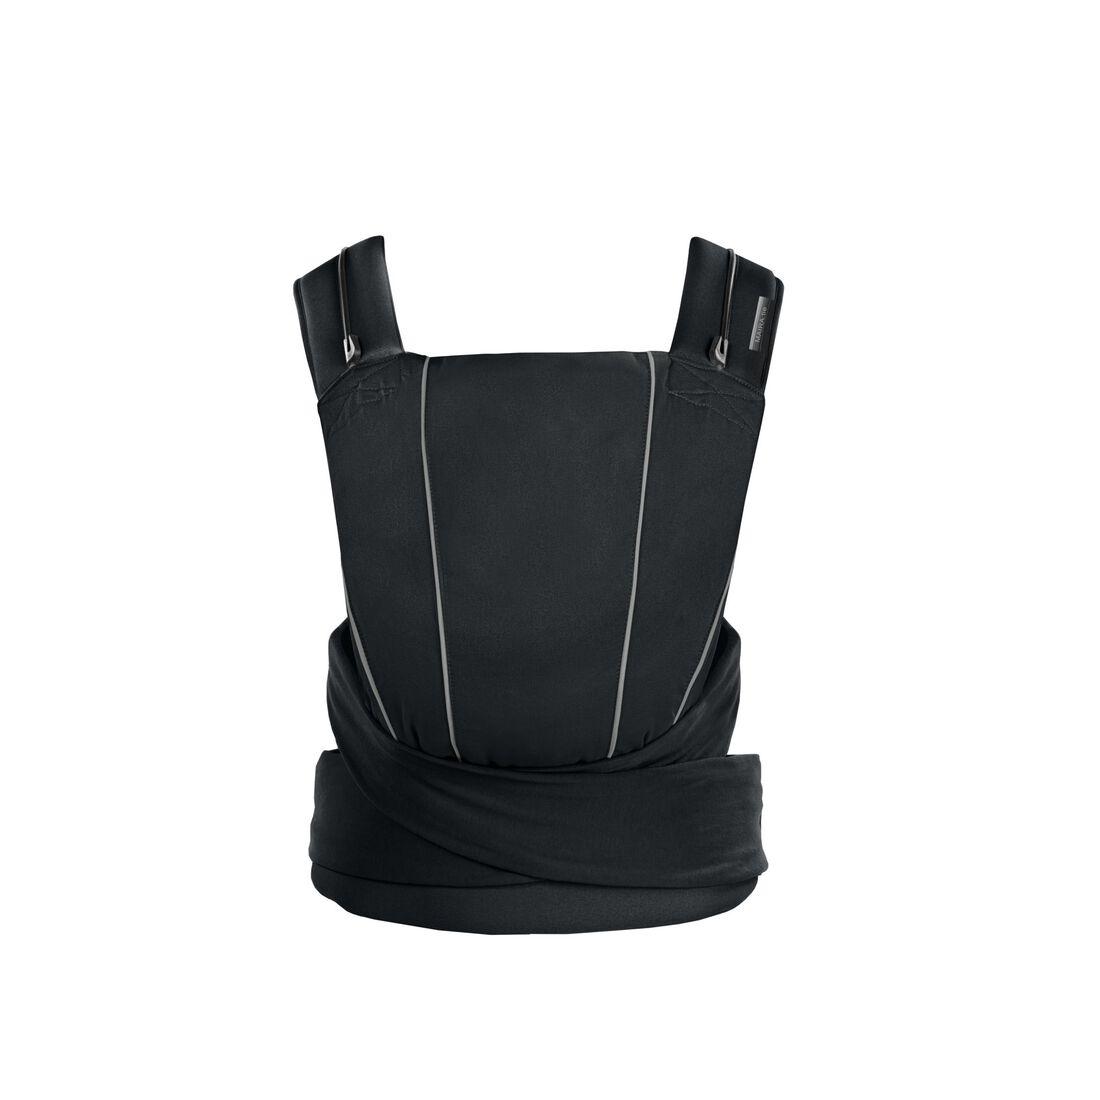 CYBEX Maira Tie - Lavastone Black in Lavastone Black large Bild 1